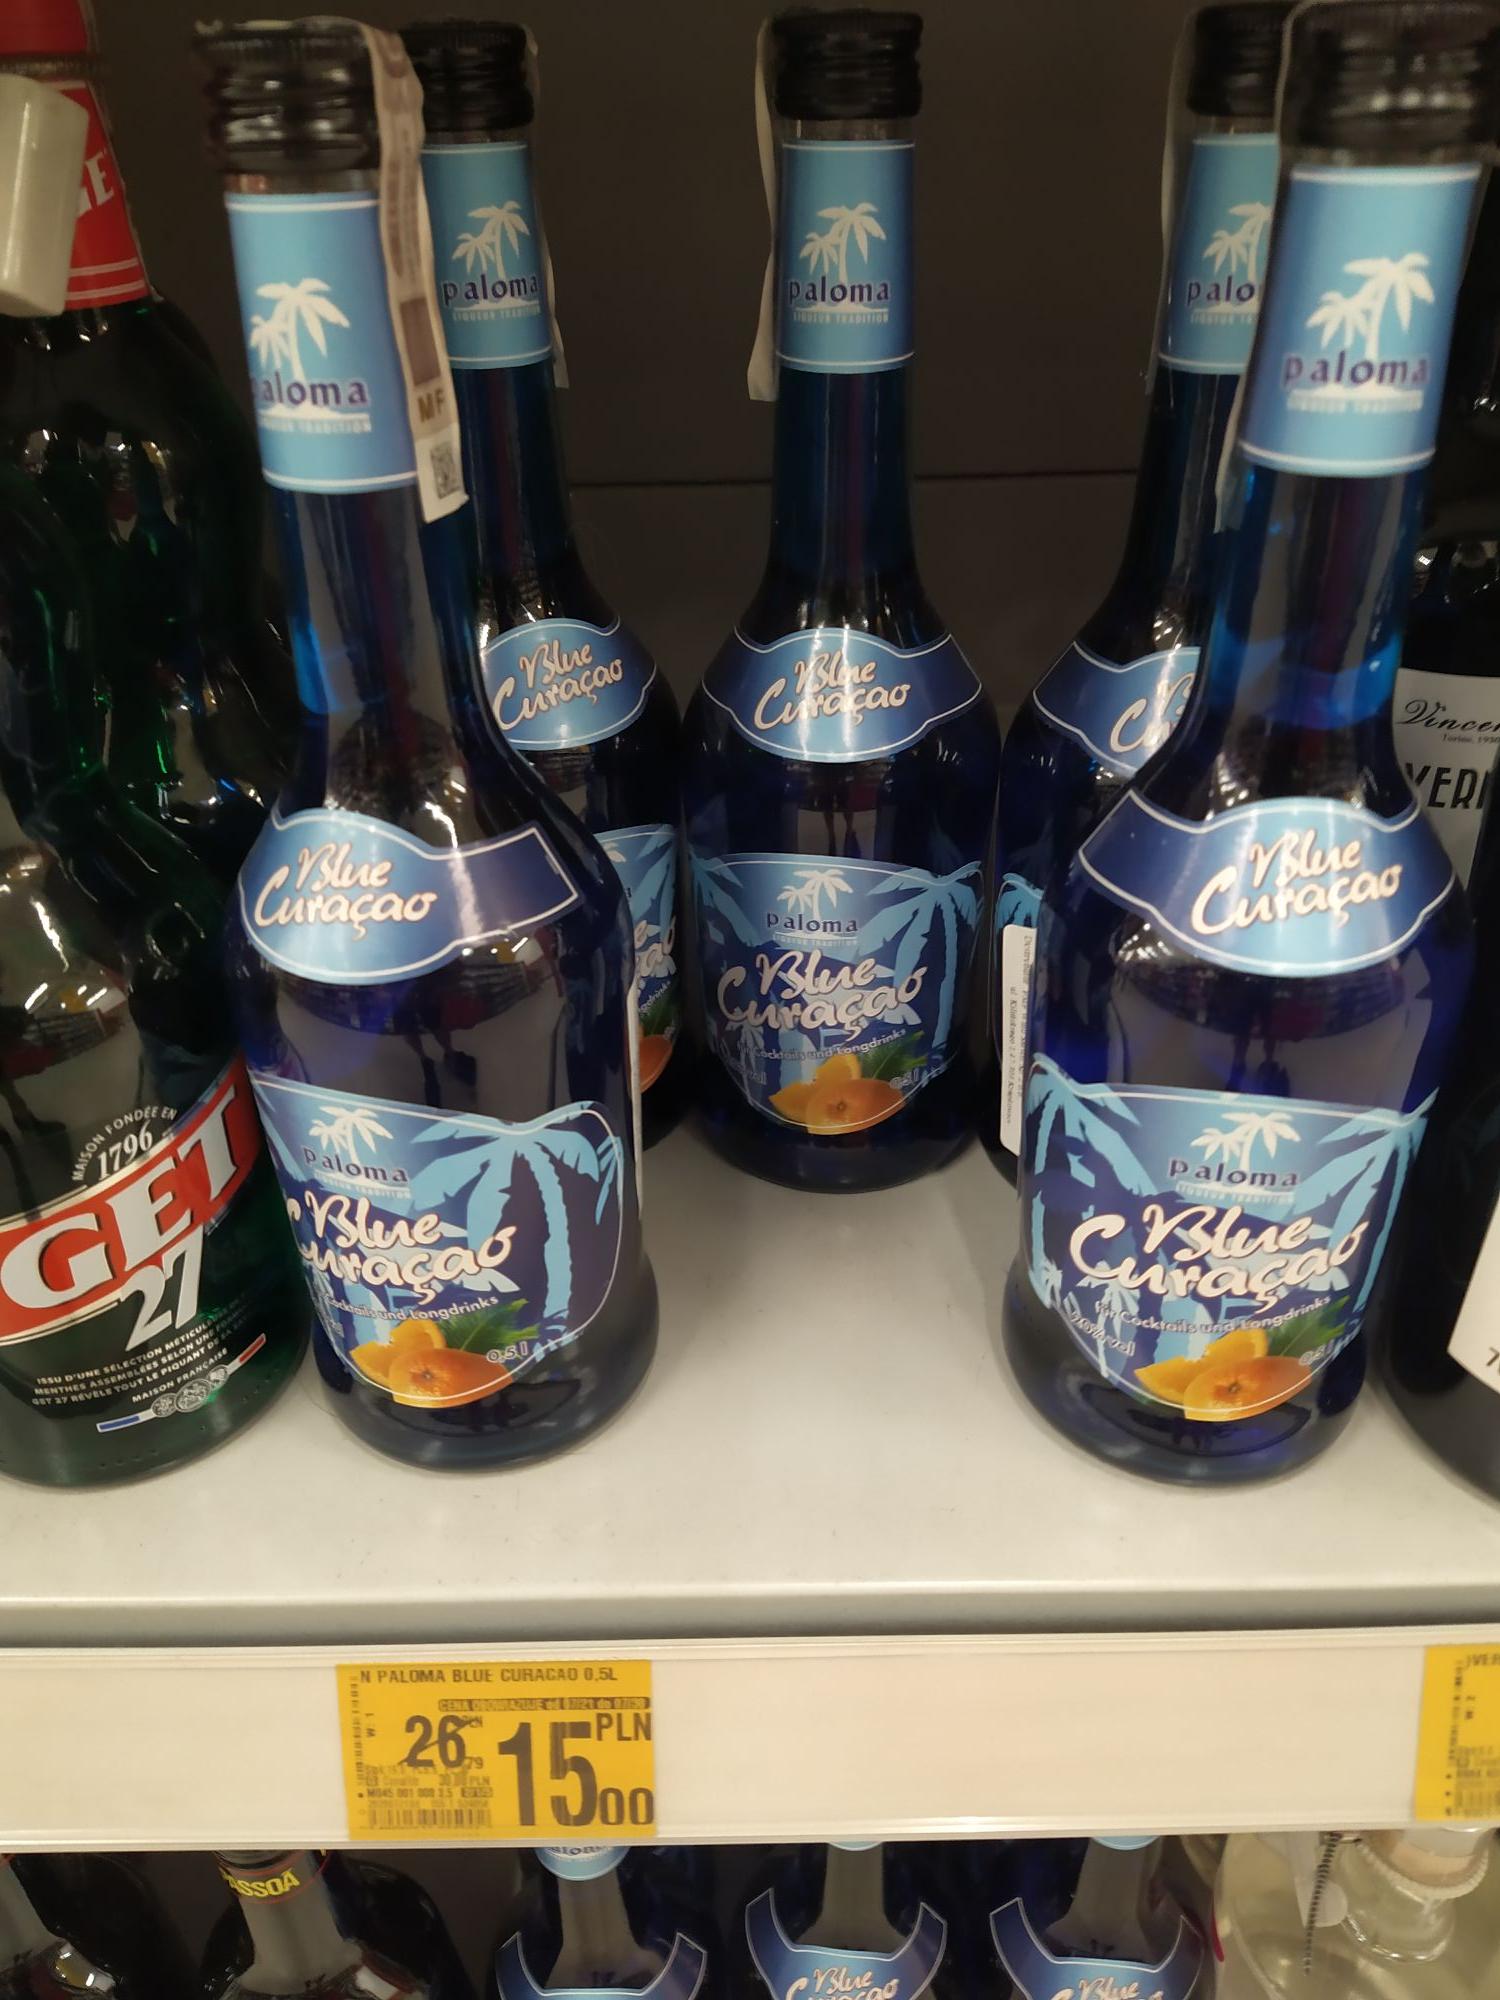 Blue curacao , wódka khortytsa , nalewka babuni - Promocja alkohole Dąbrowa Górnicza Auchan katowicka